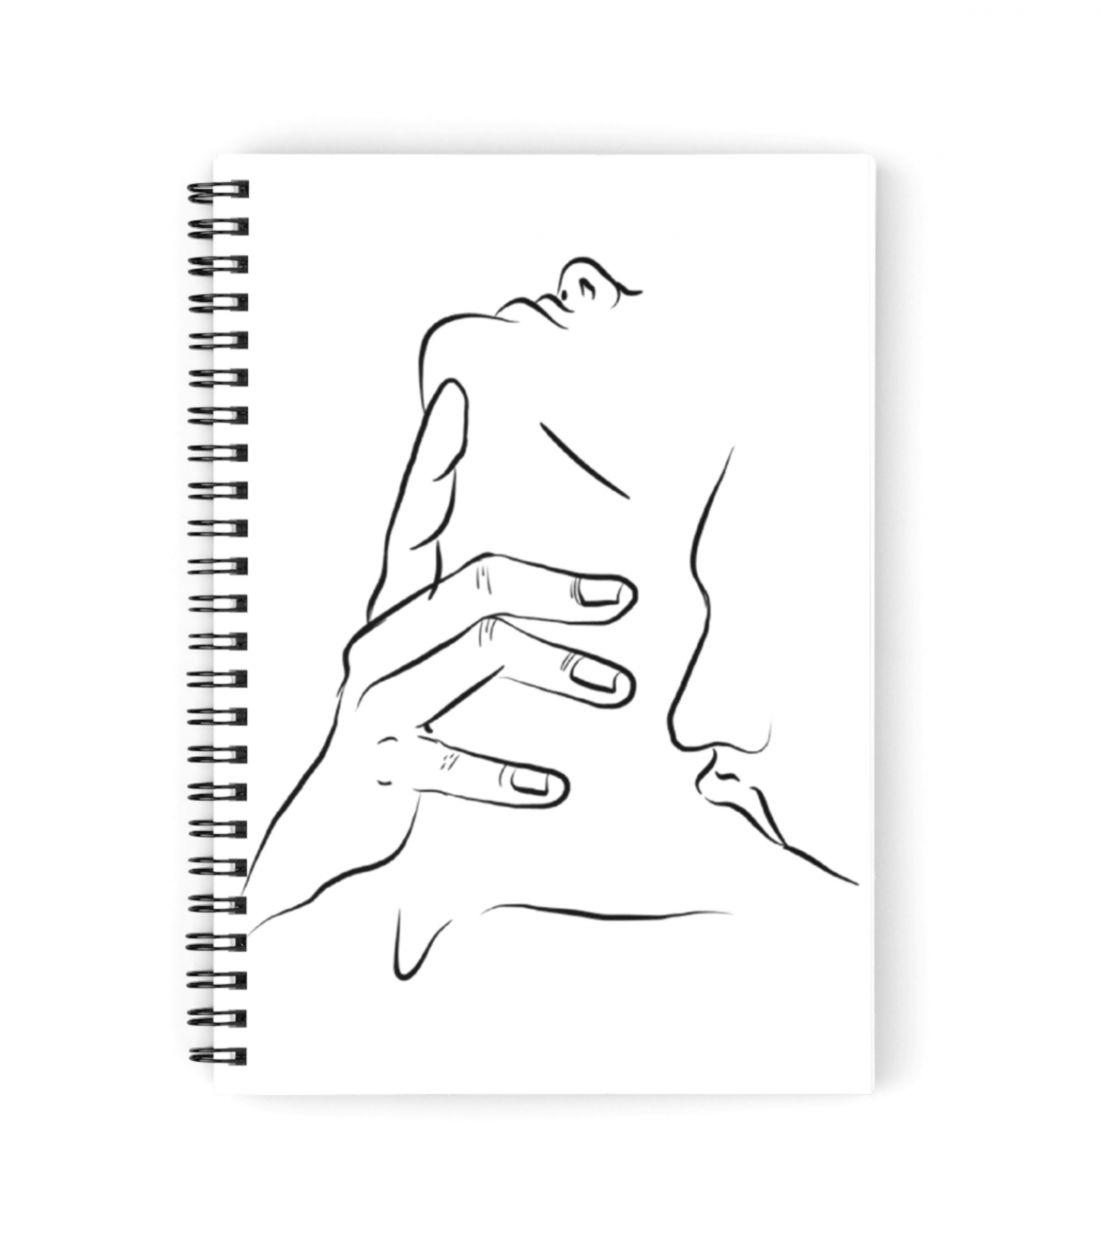 Tumblr type romance sticker spiral notebooks by asher white